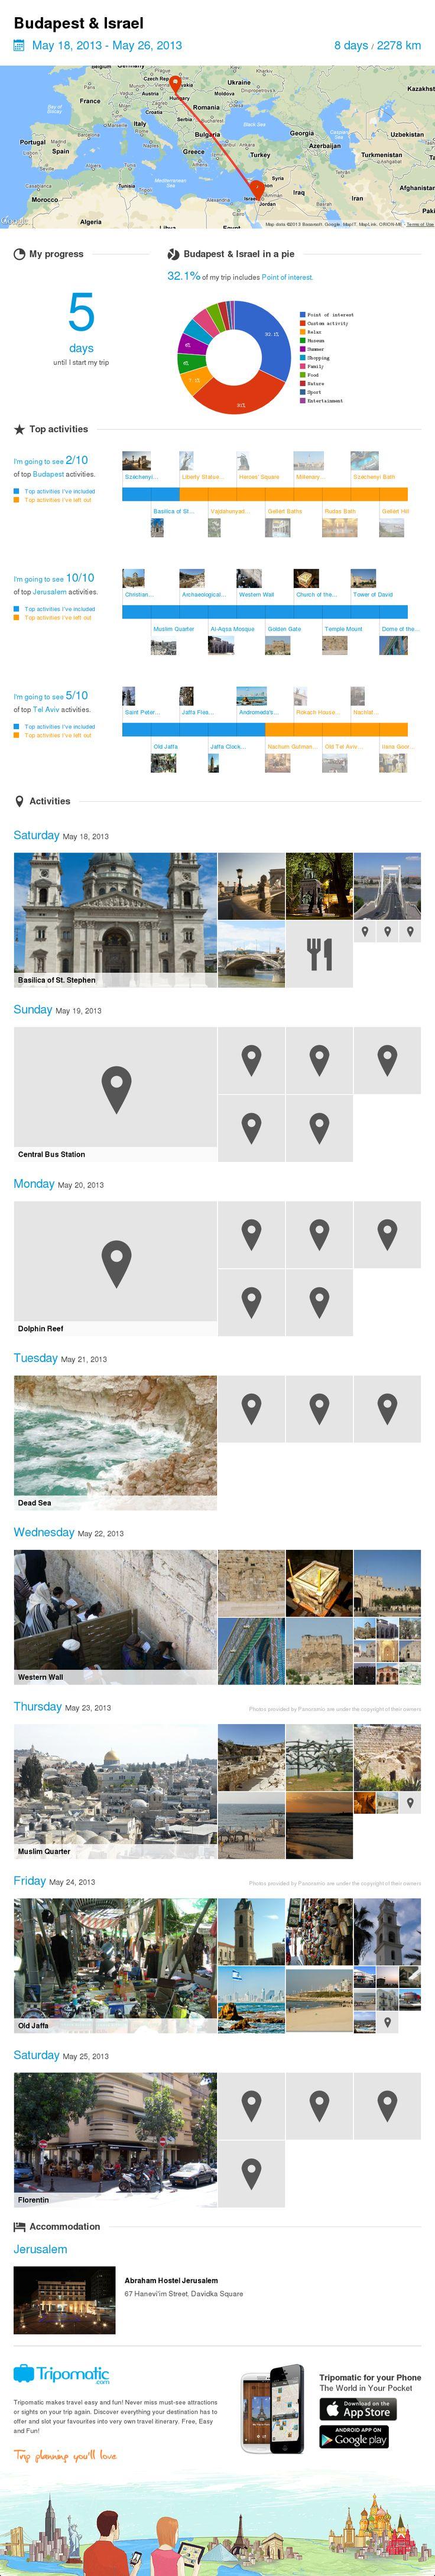 Check out my awesome trip to Budapest, Rishon LeẔiyyon, Tel Aviv, Taba and Jerusalem!